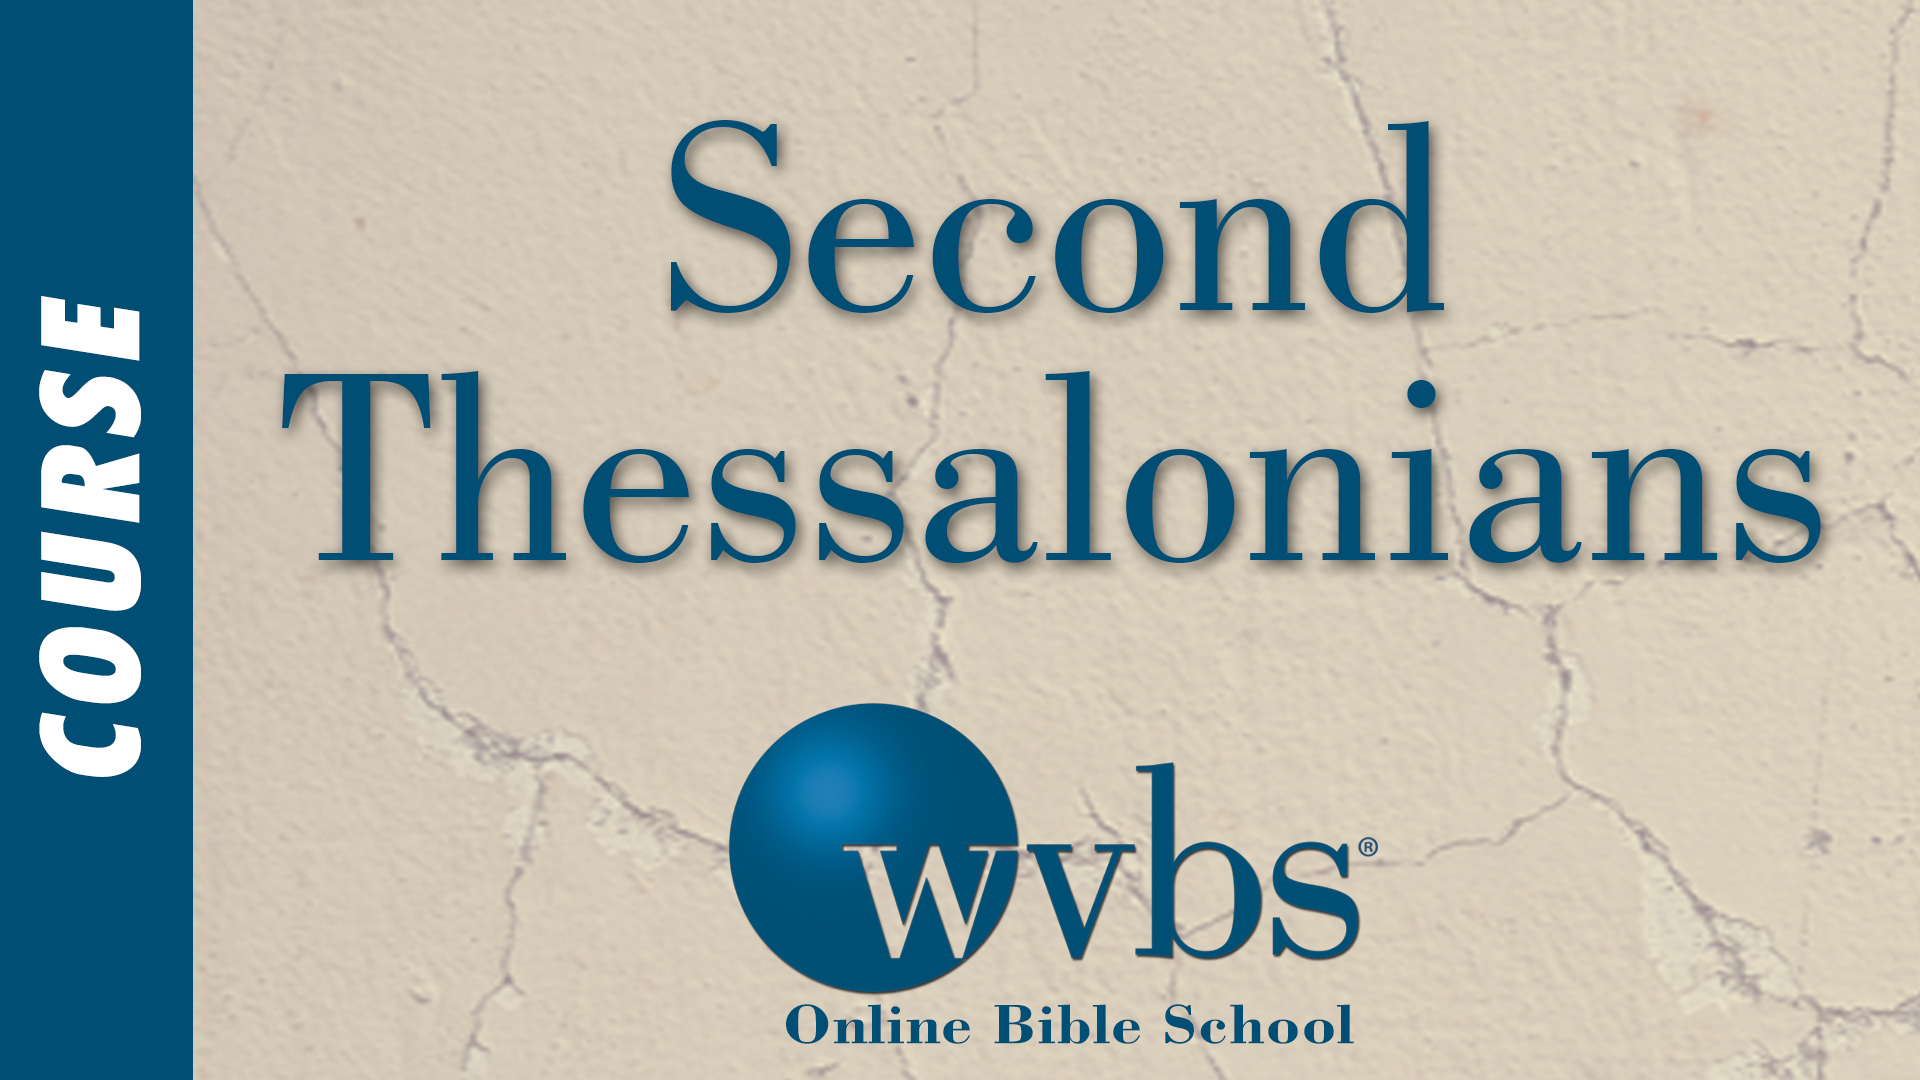 Second Thessalonians (Online Bible School)